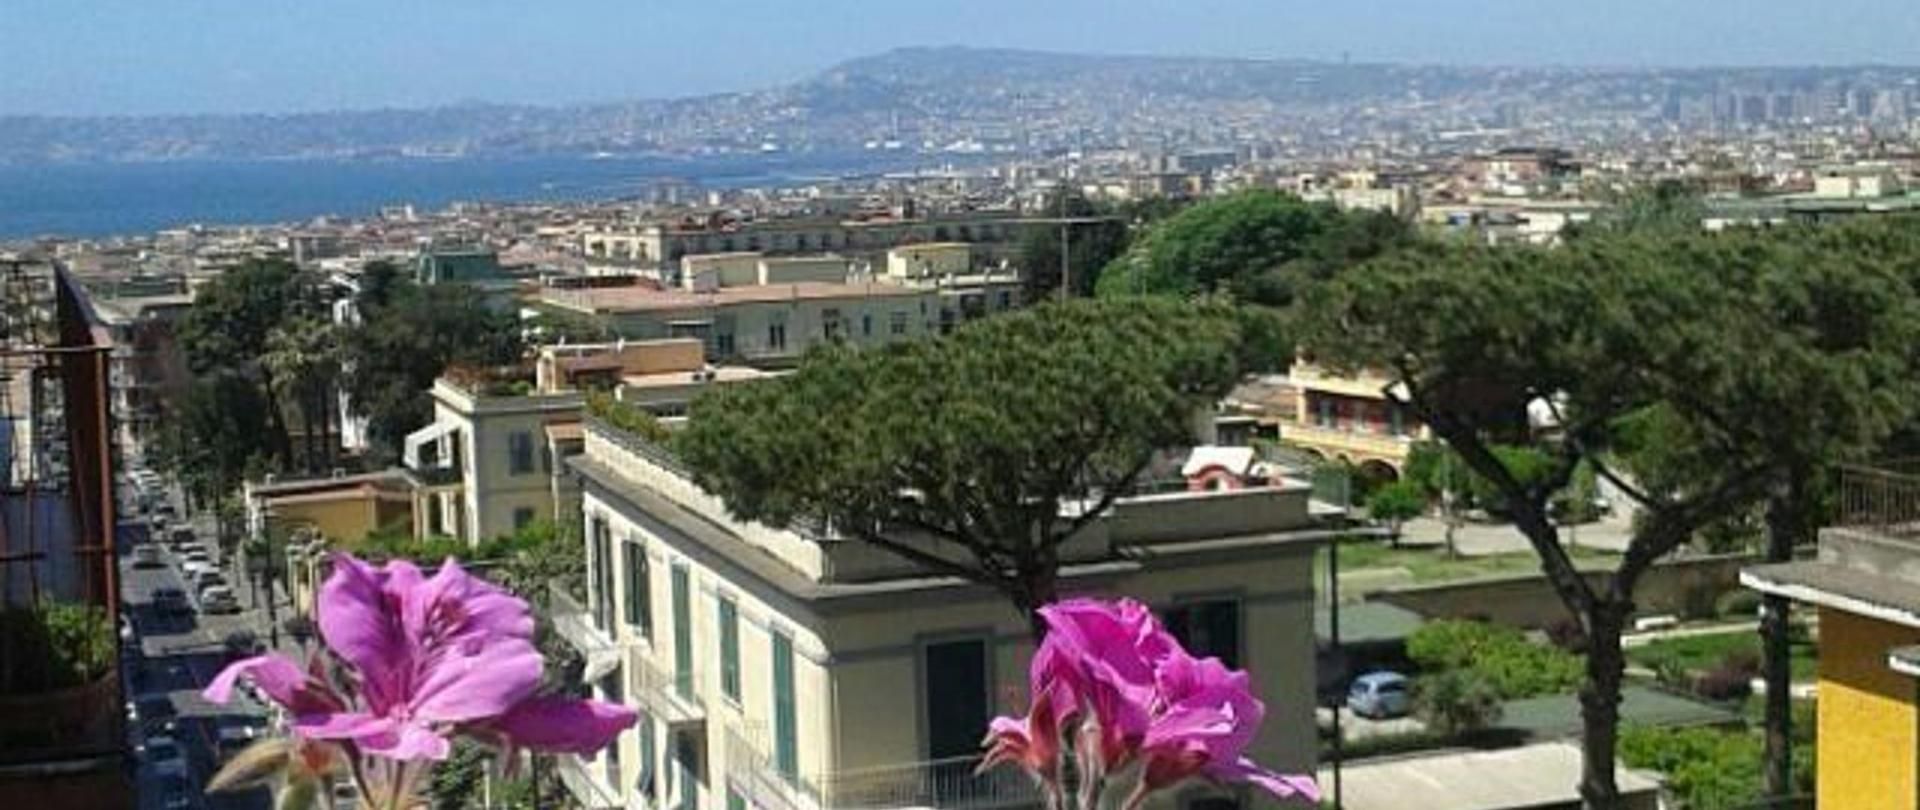 spring-memories-oggi-piove-bblabellavista-view-terrace-landscape-springmemories-flowers-sun-blusky-rainy-portici-napoli-visitnaples-visititaly-italy-italiaislove.jpg